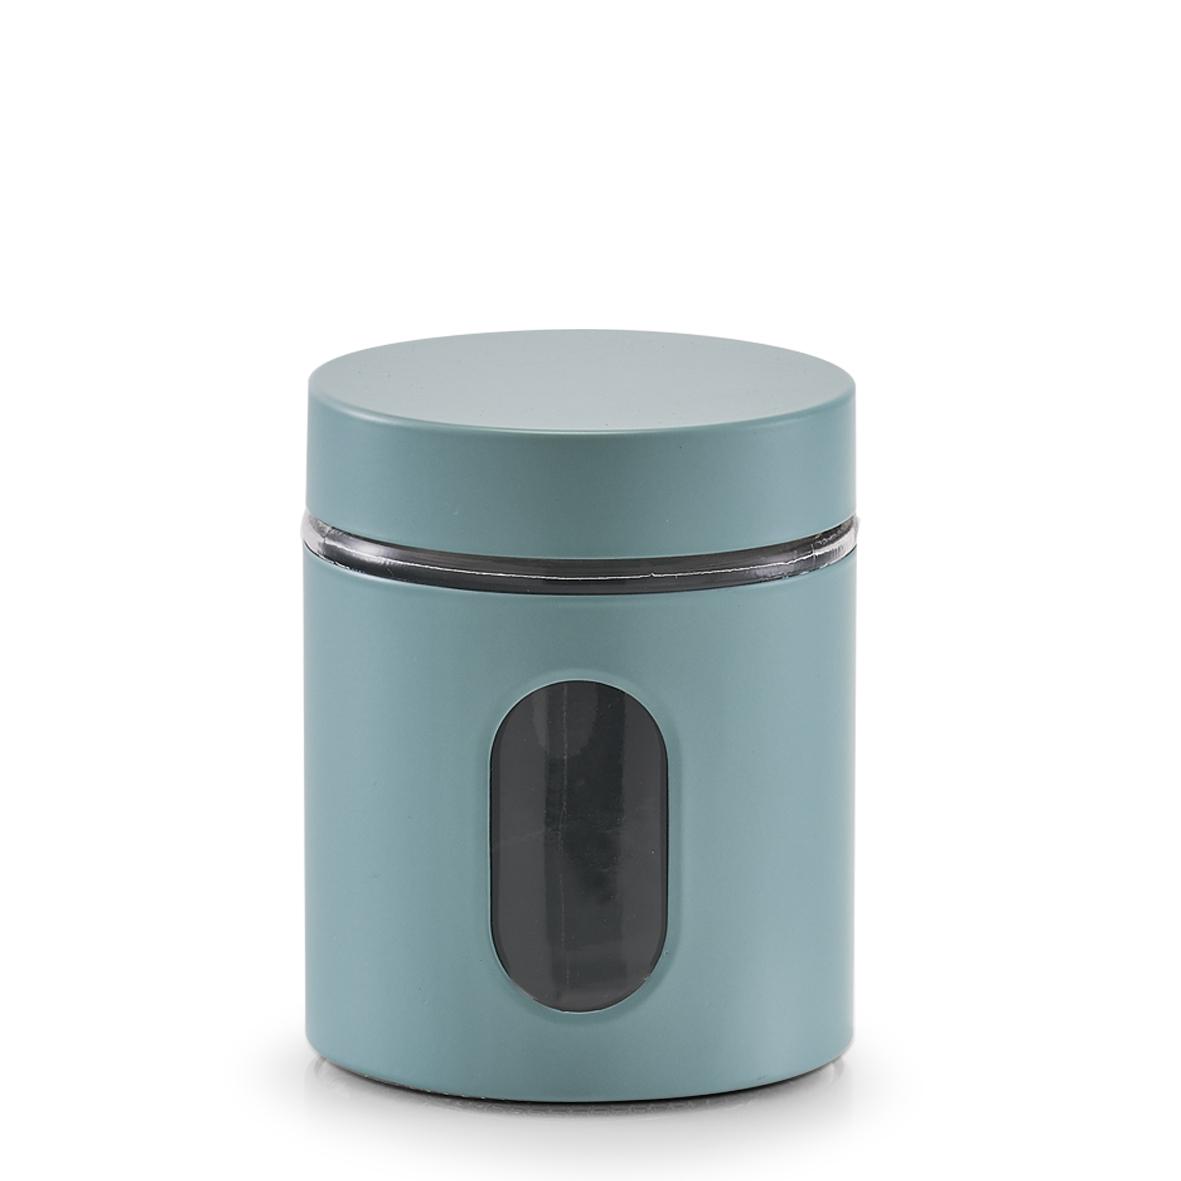 Recipient pentru depozitare Visual, metal si sticla, Bleu 600 ml, Ø10,2xH12,5 cm